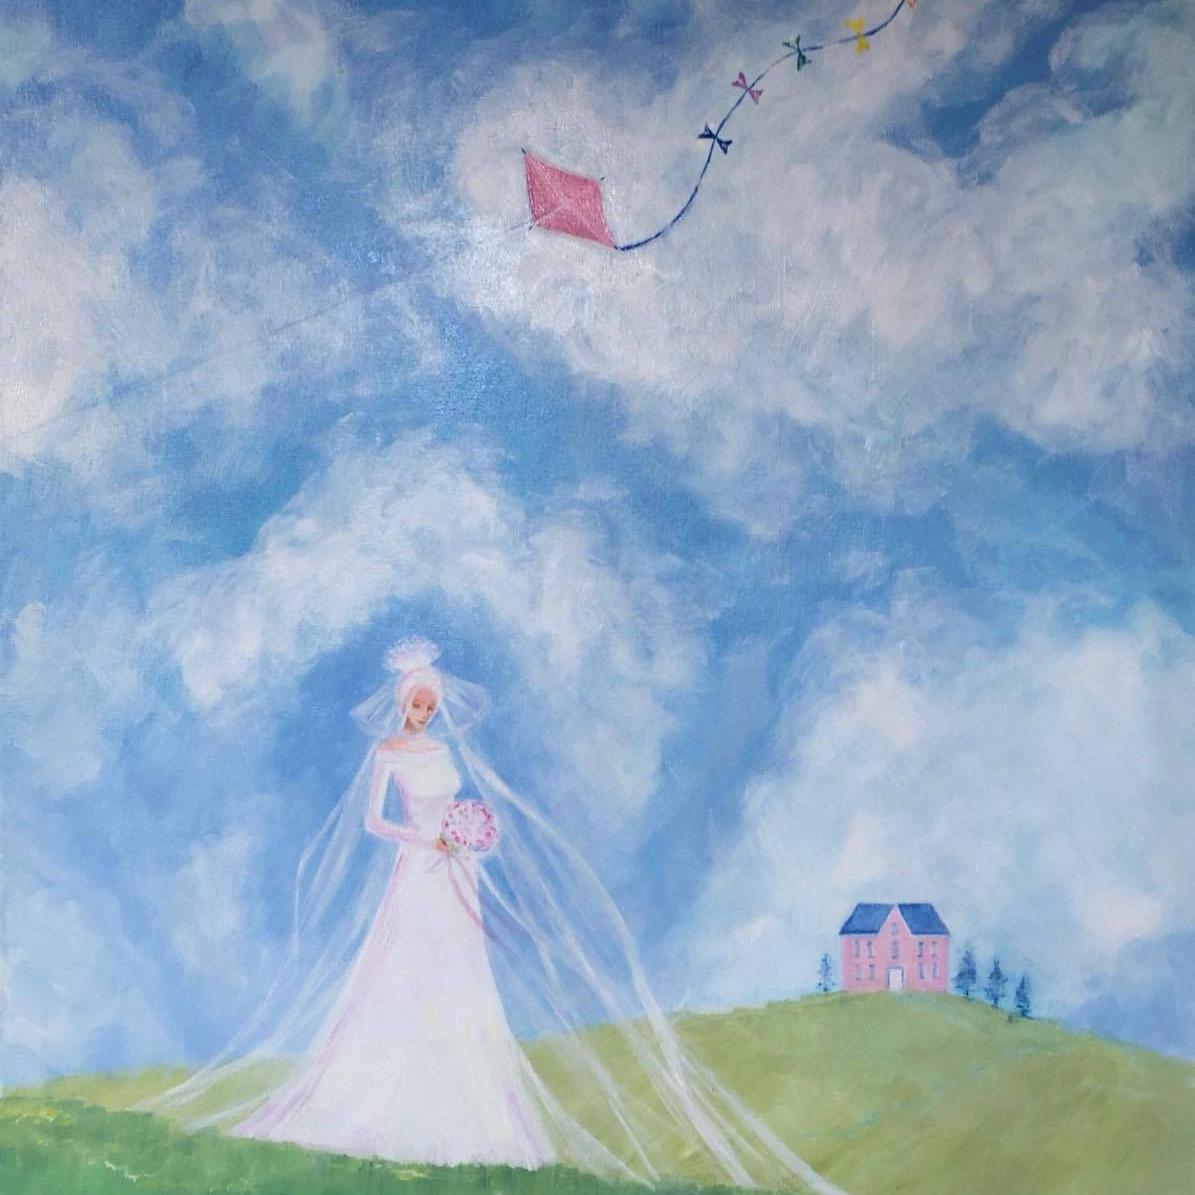 Image;   Tracey Yannopoulos, Spring Bride, oil on canvas, 80cm x 125cm